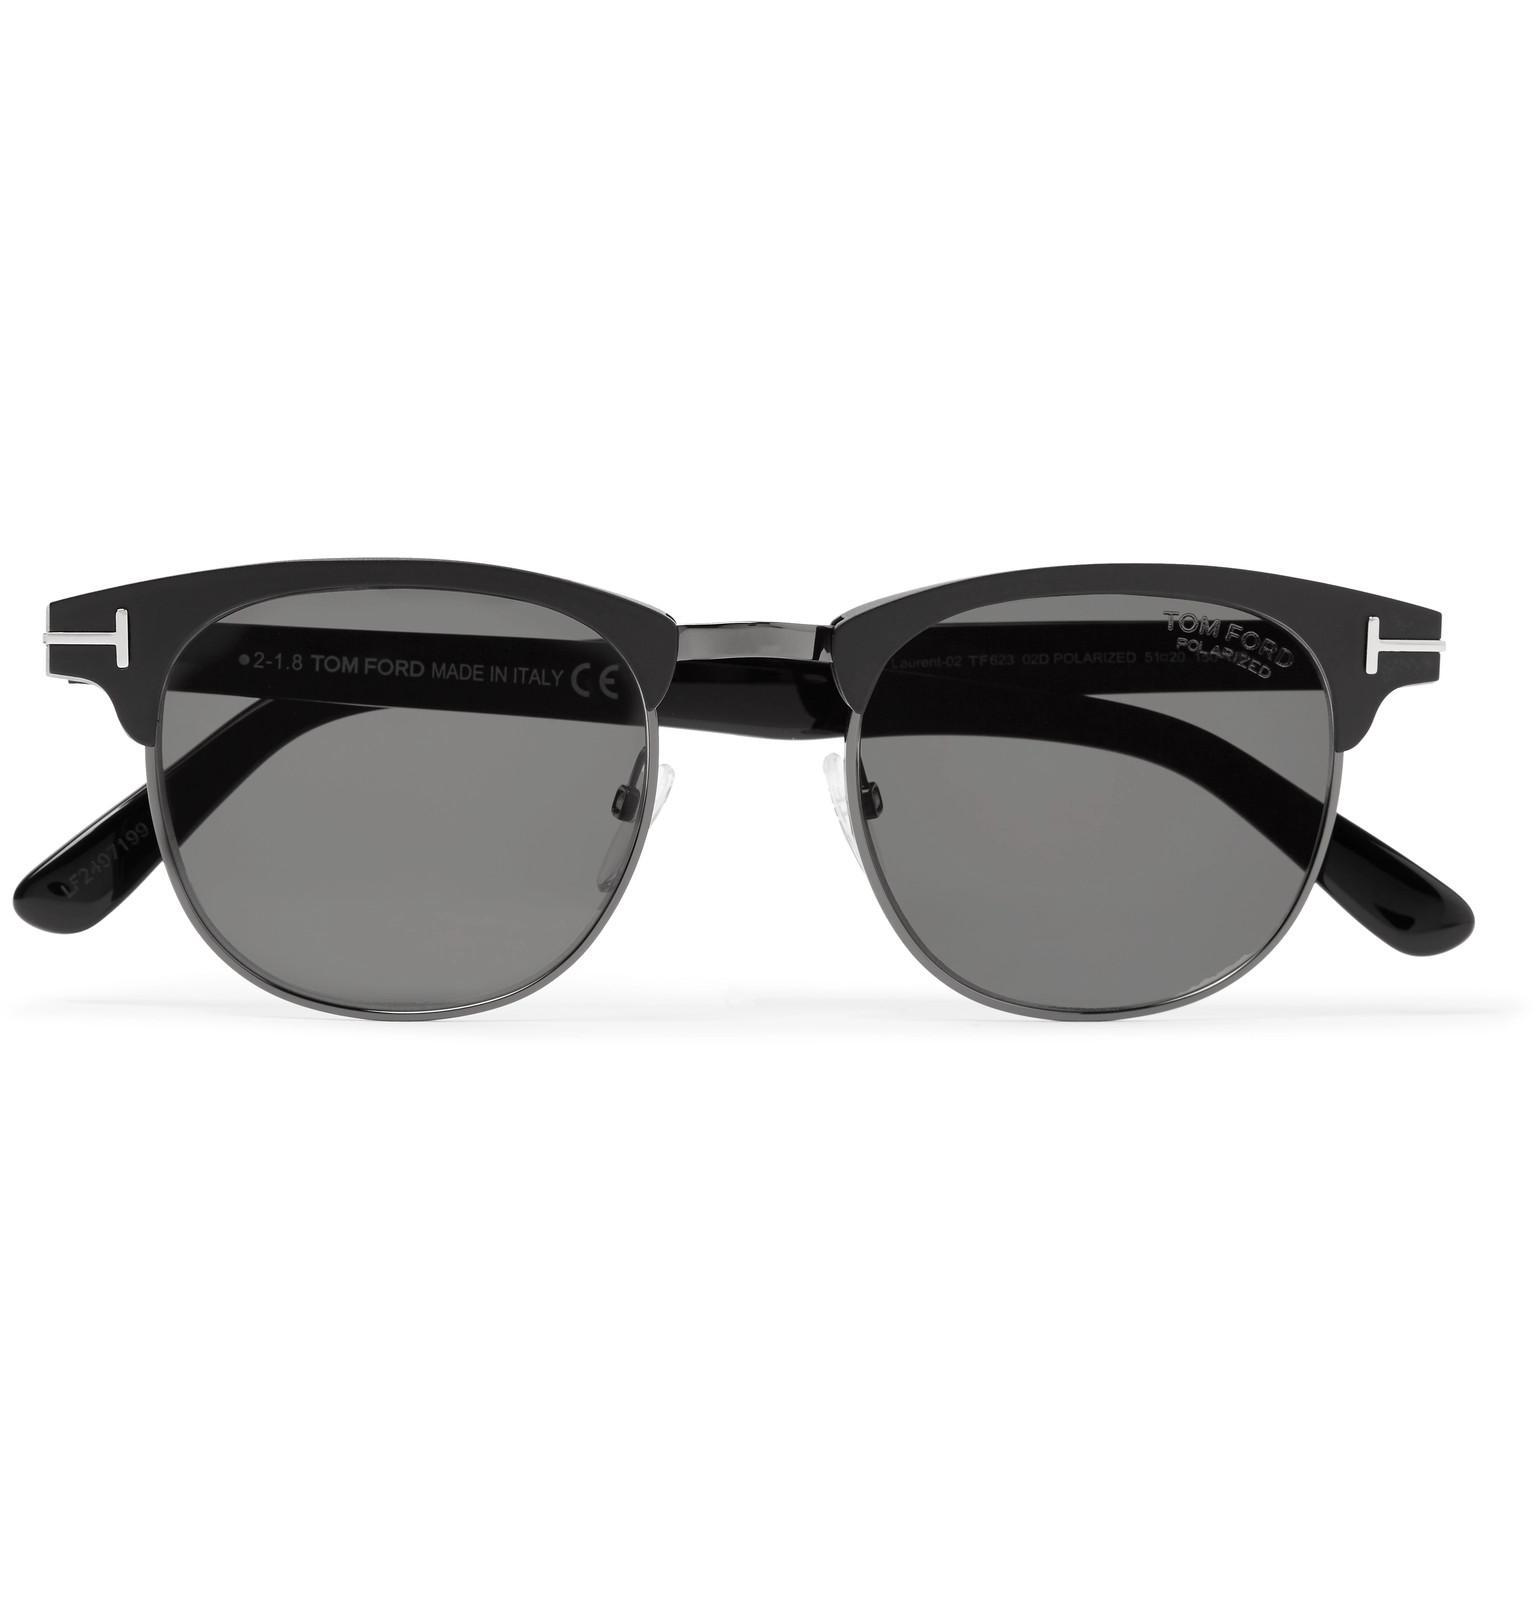 a50e57e92b8 Tom Ford. Men s Black Laurent D-frame Acetate And Gunmetal-tone Polarised  Sunglasses